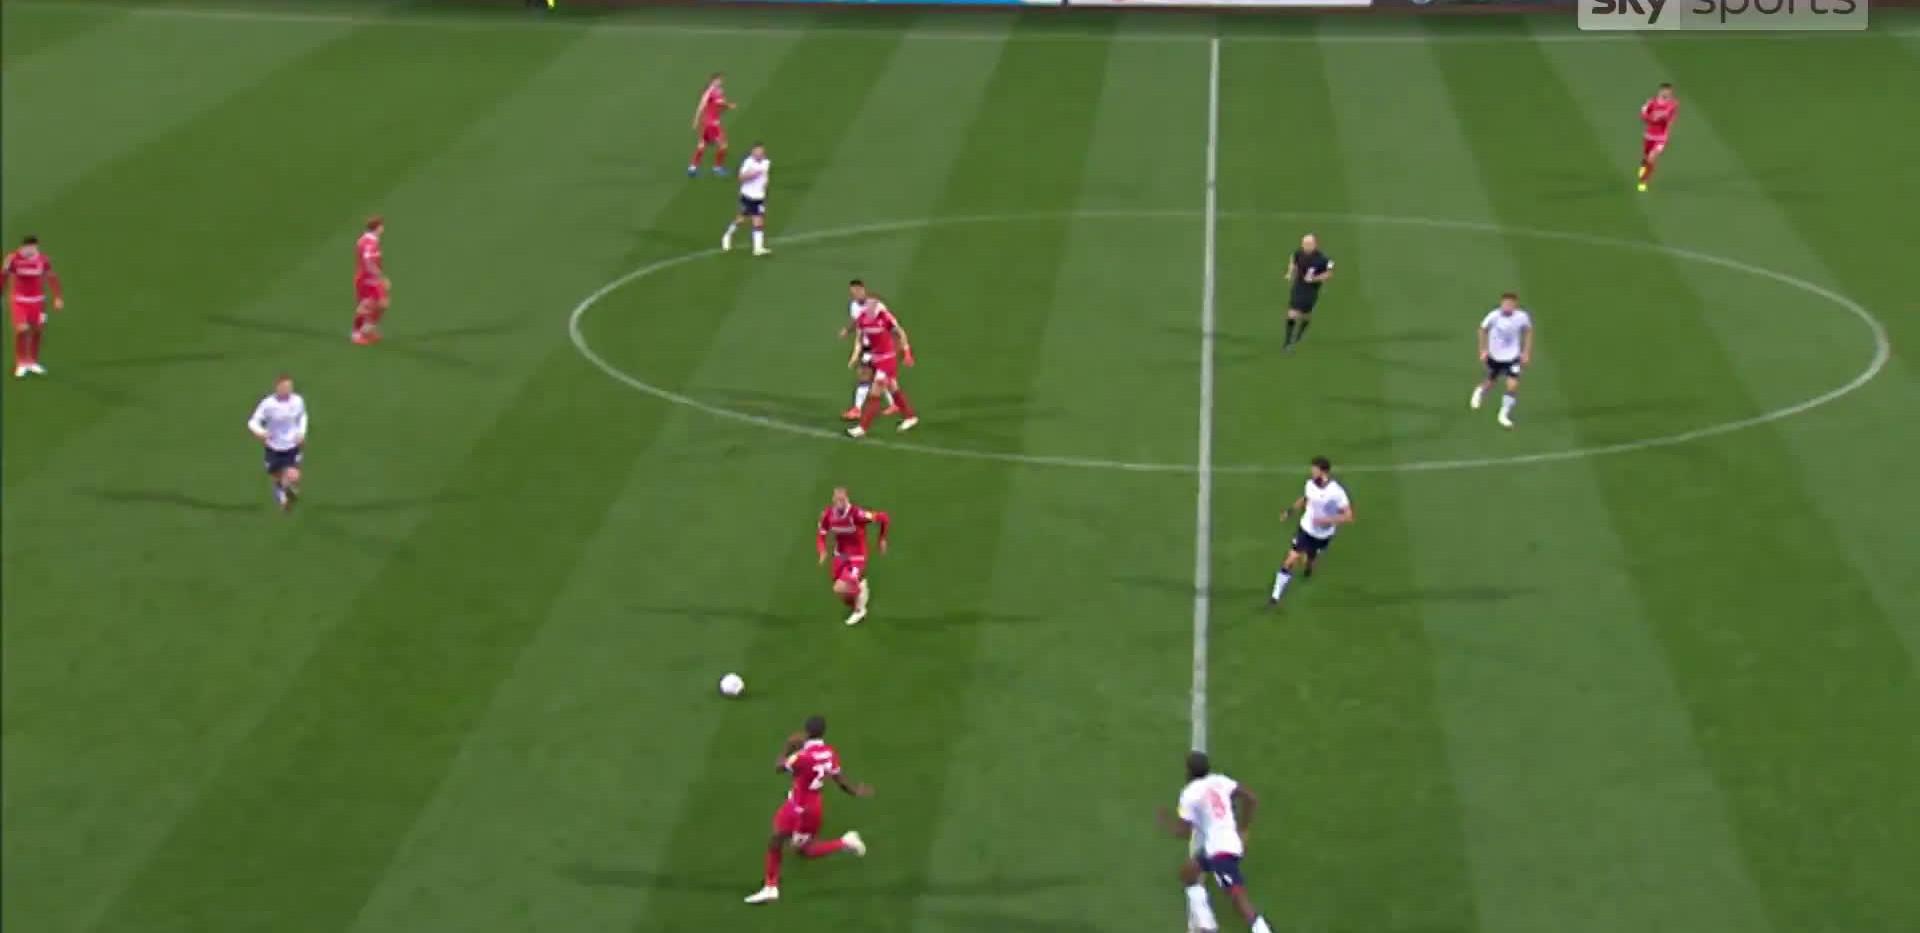 Bolton Wanderers v Nottingham Forest